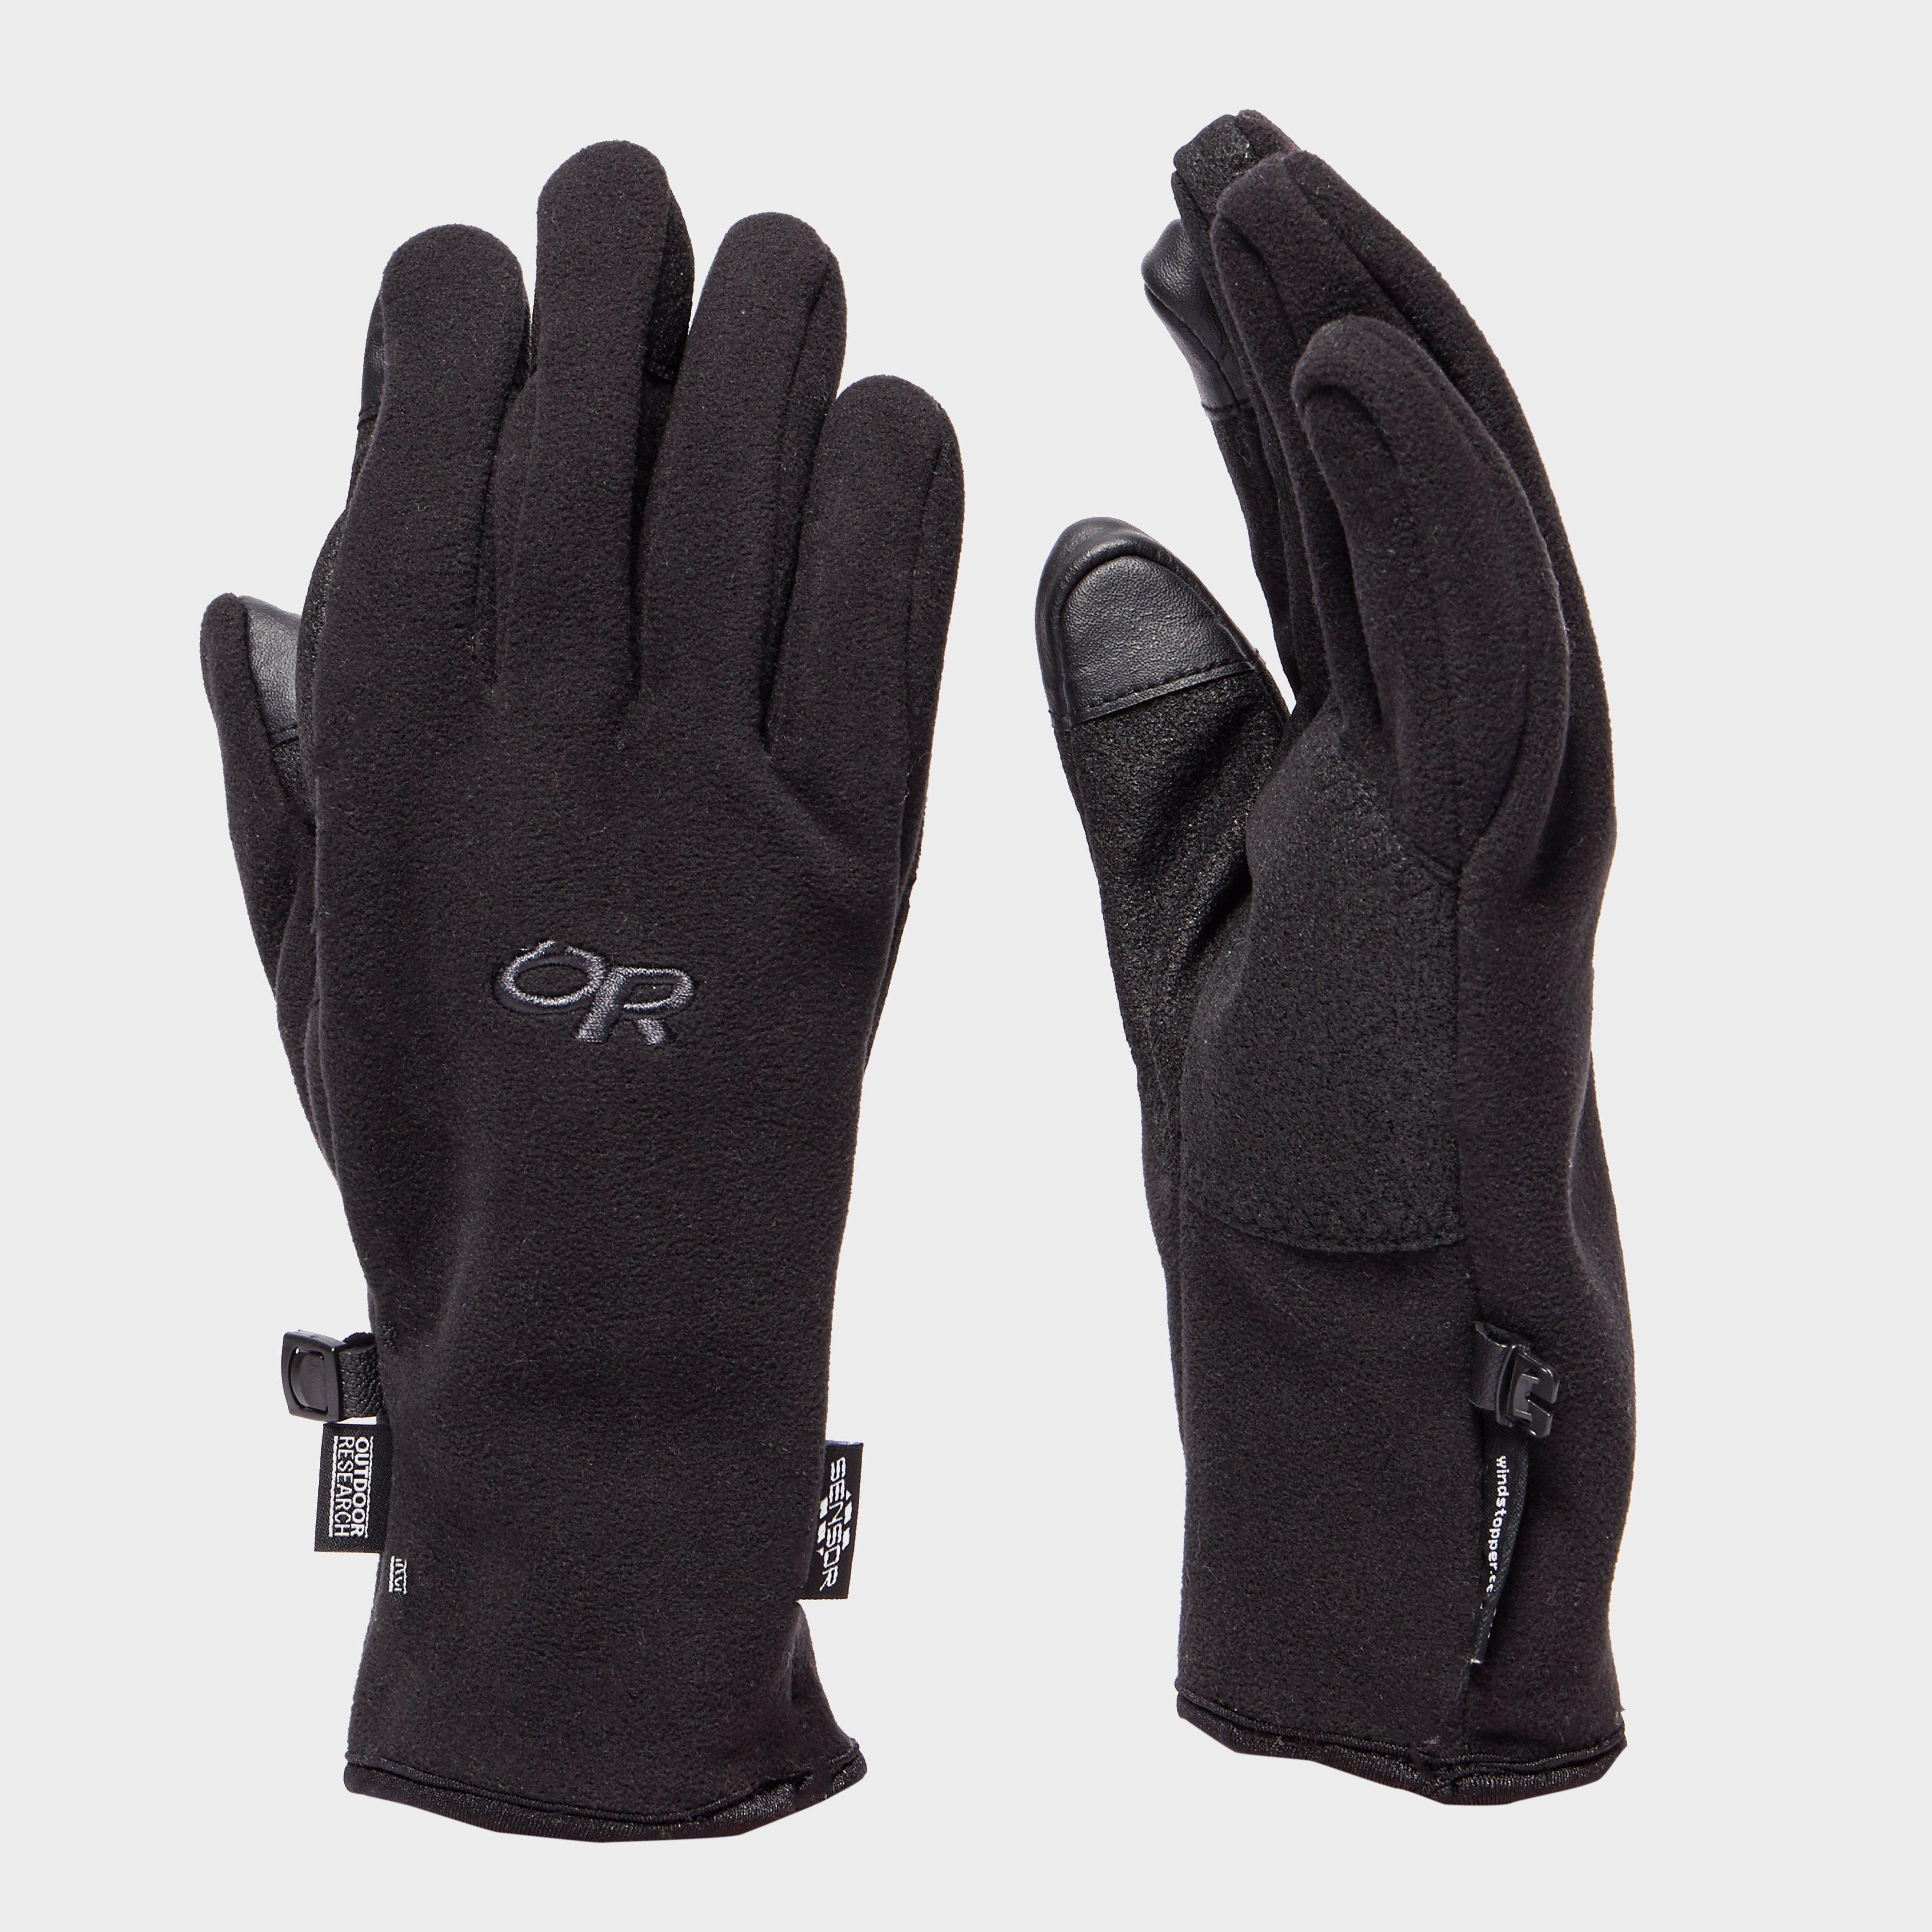 Outdoor Research Outdoor Research Mens Gripper Sensor Glove - Black, Black